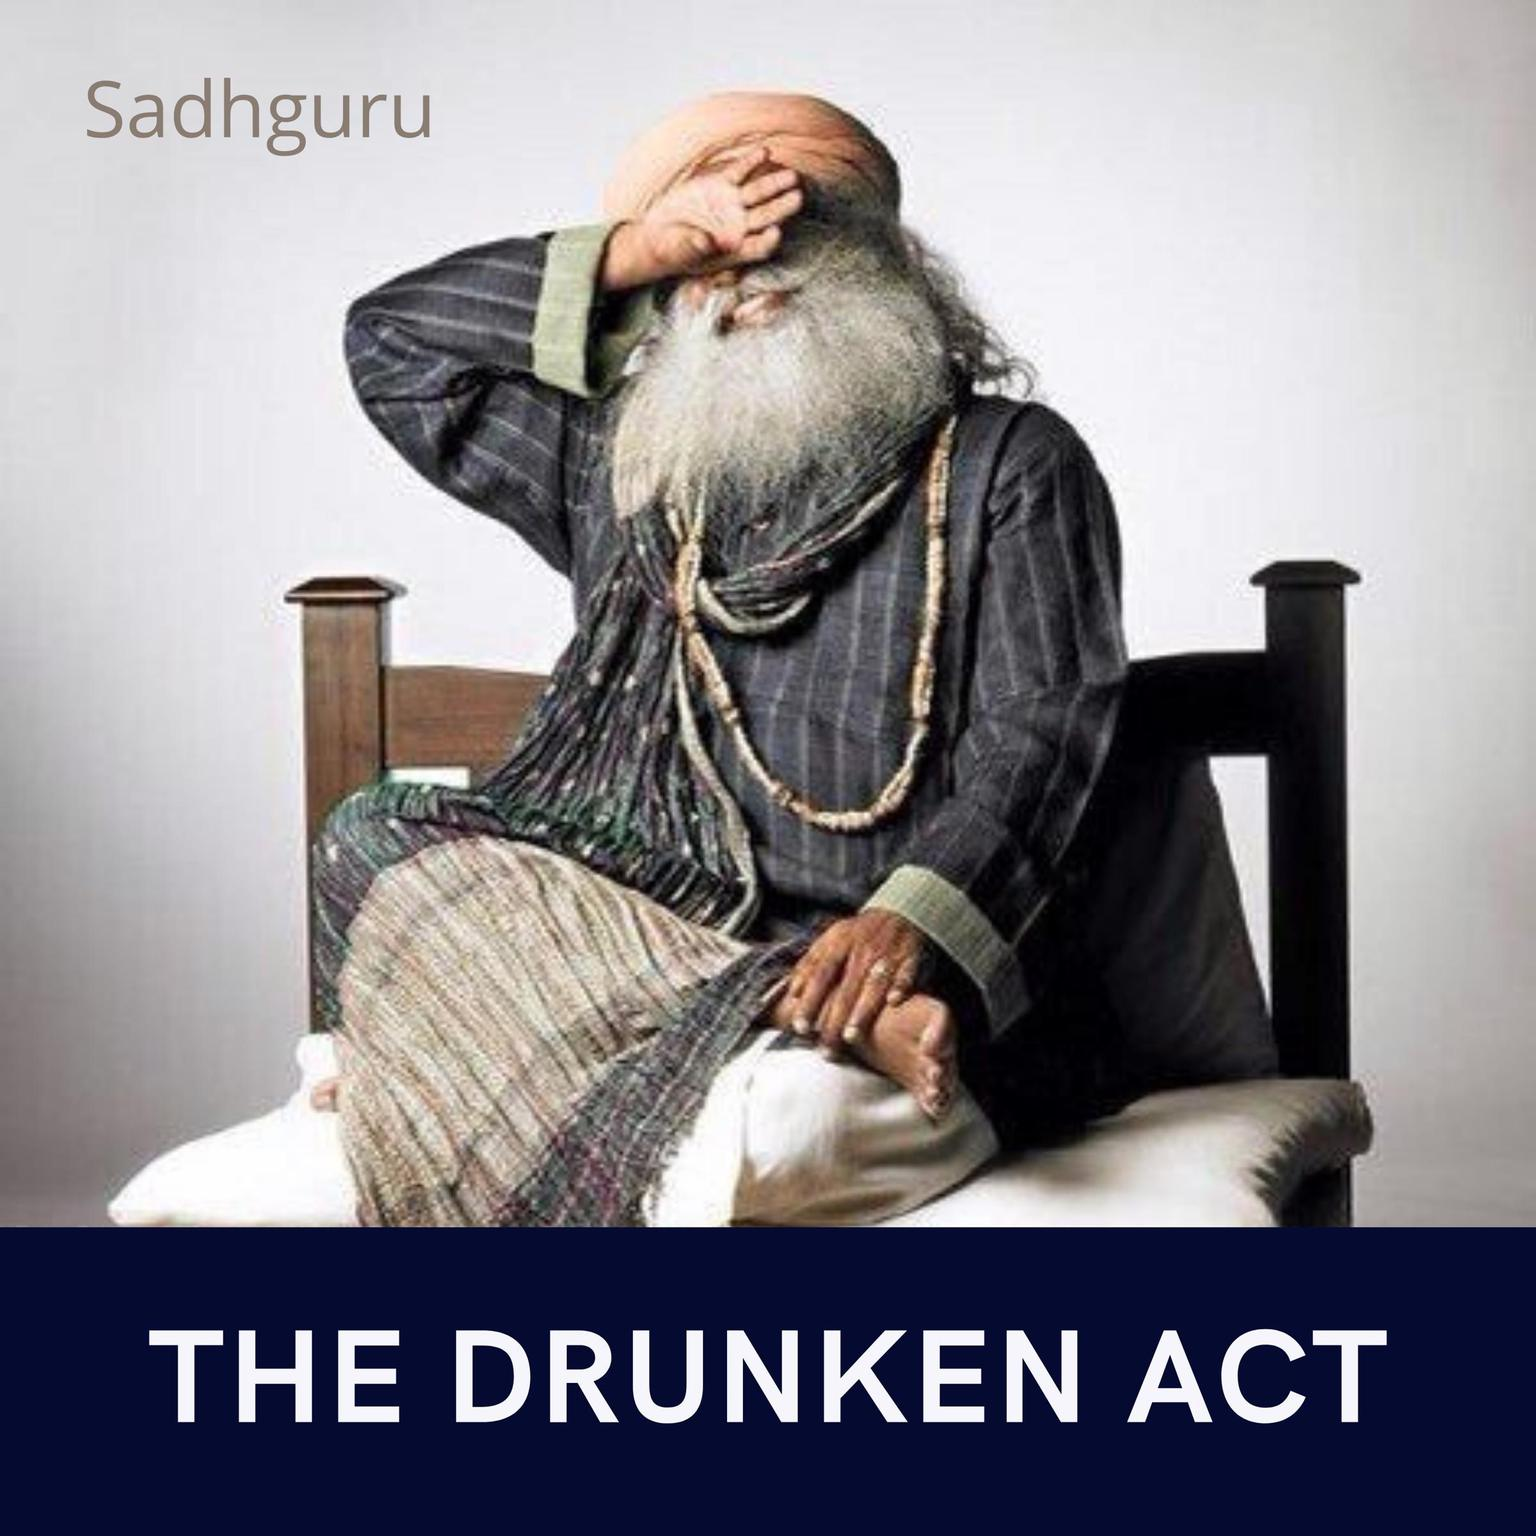 The Drunken Act Audiobook, by Sadhguru